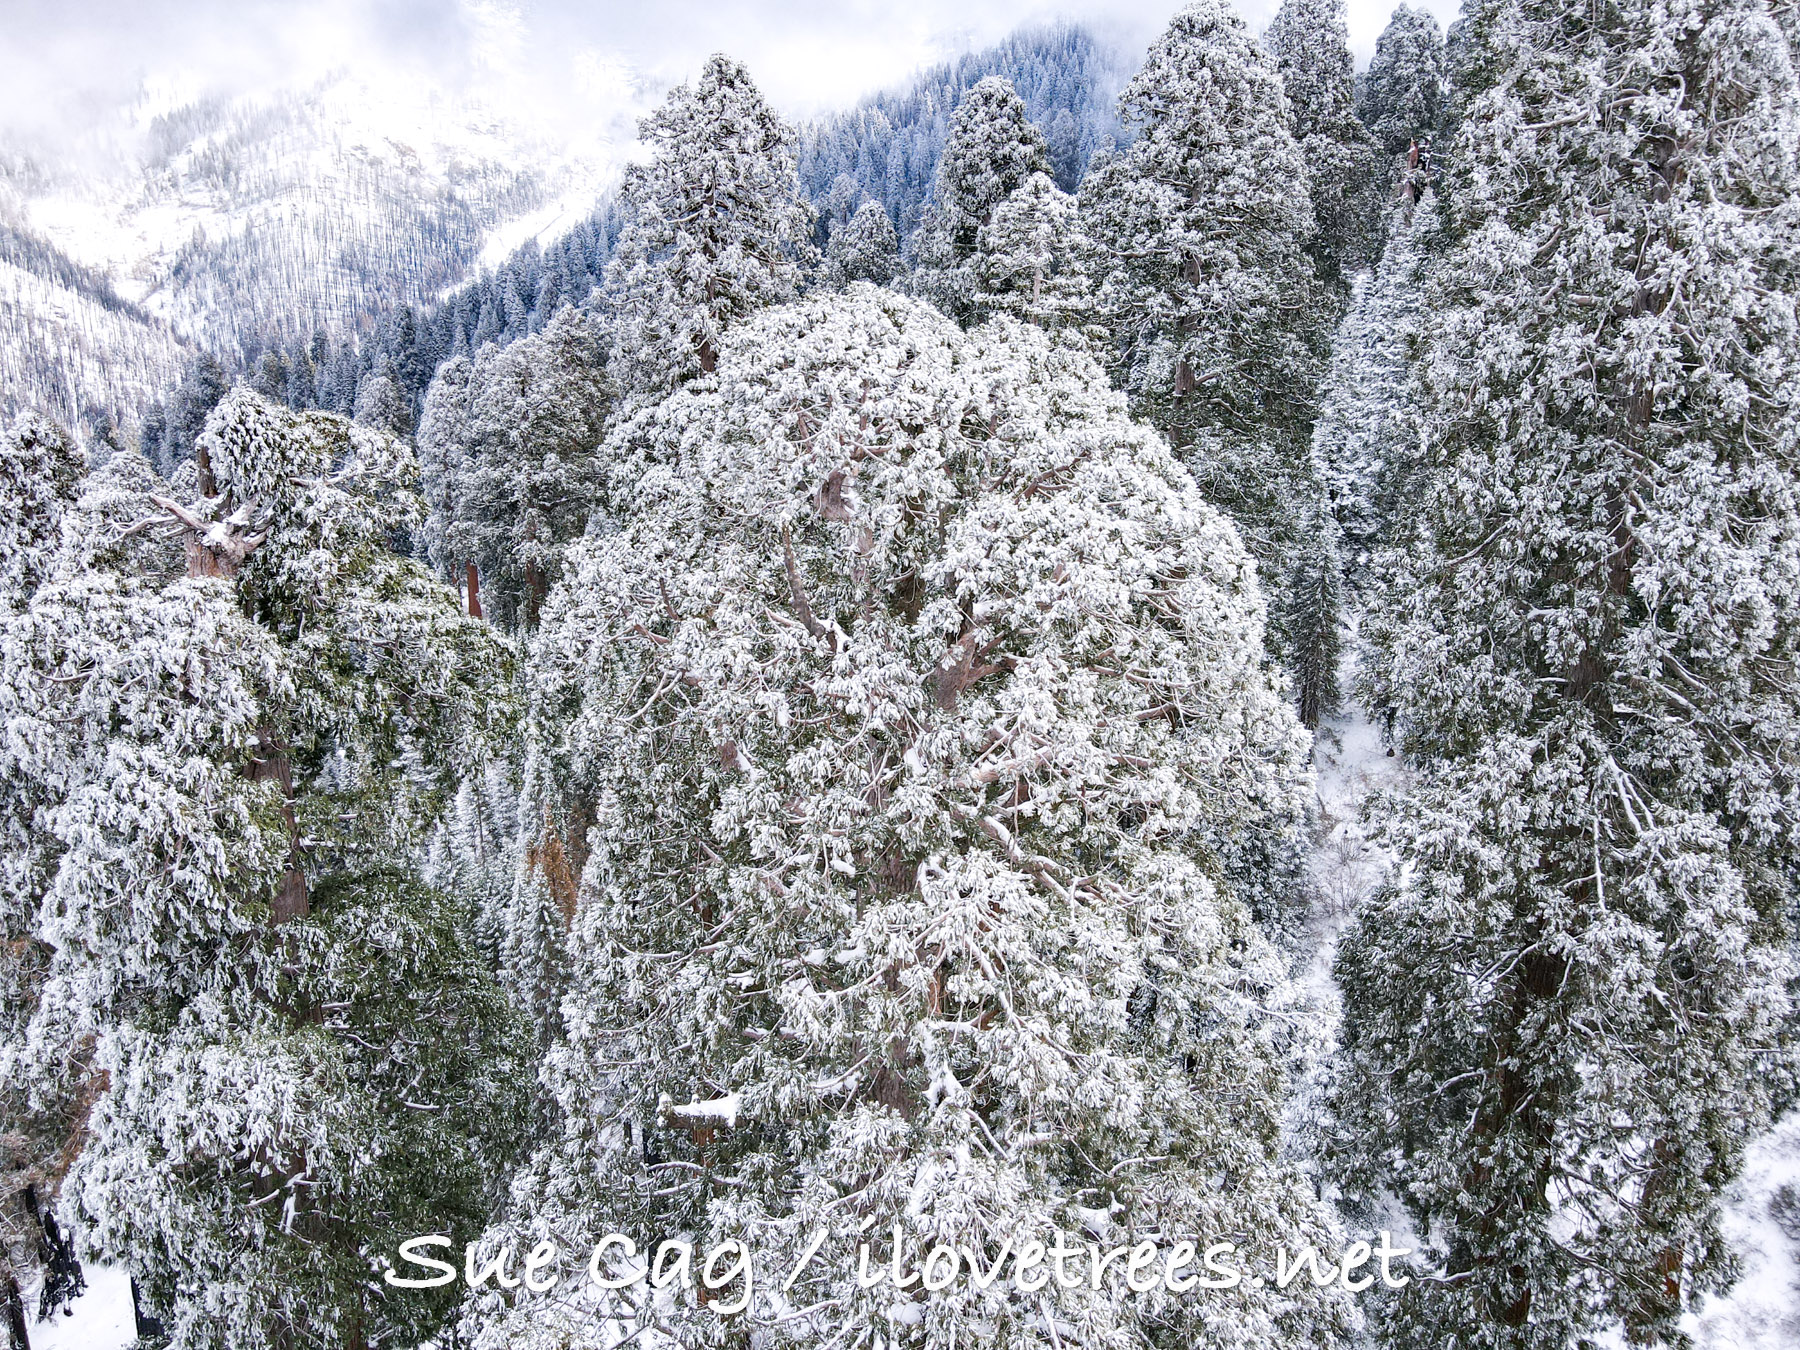 Giant Sequoias in the Snow